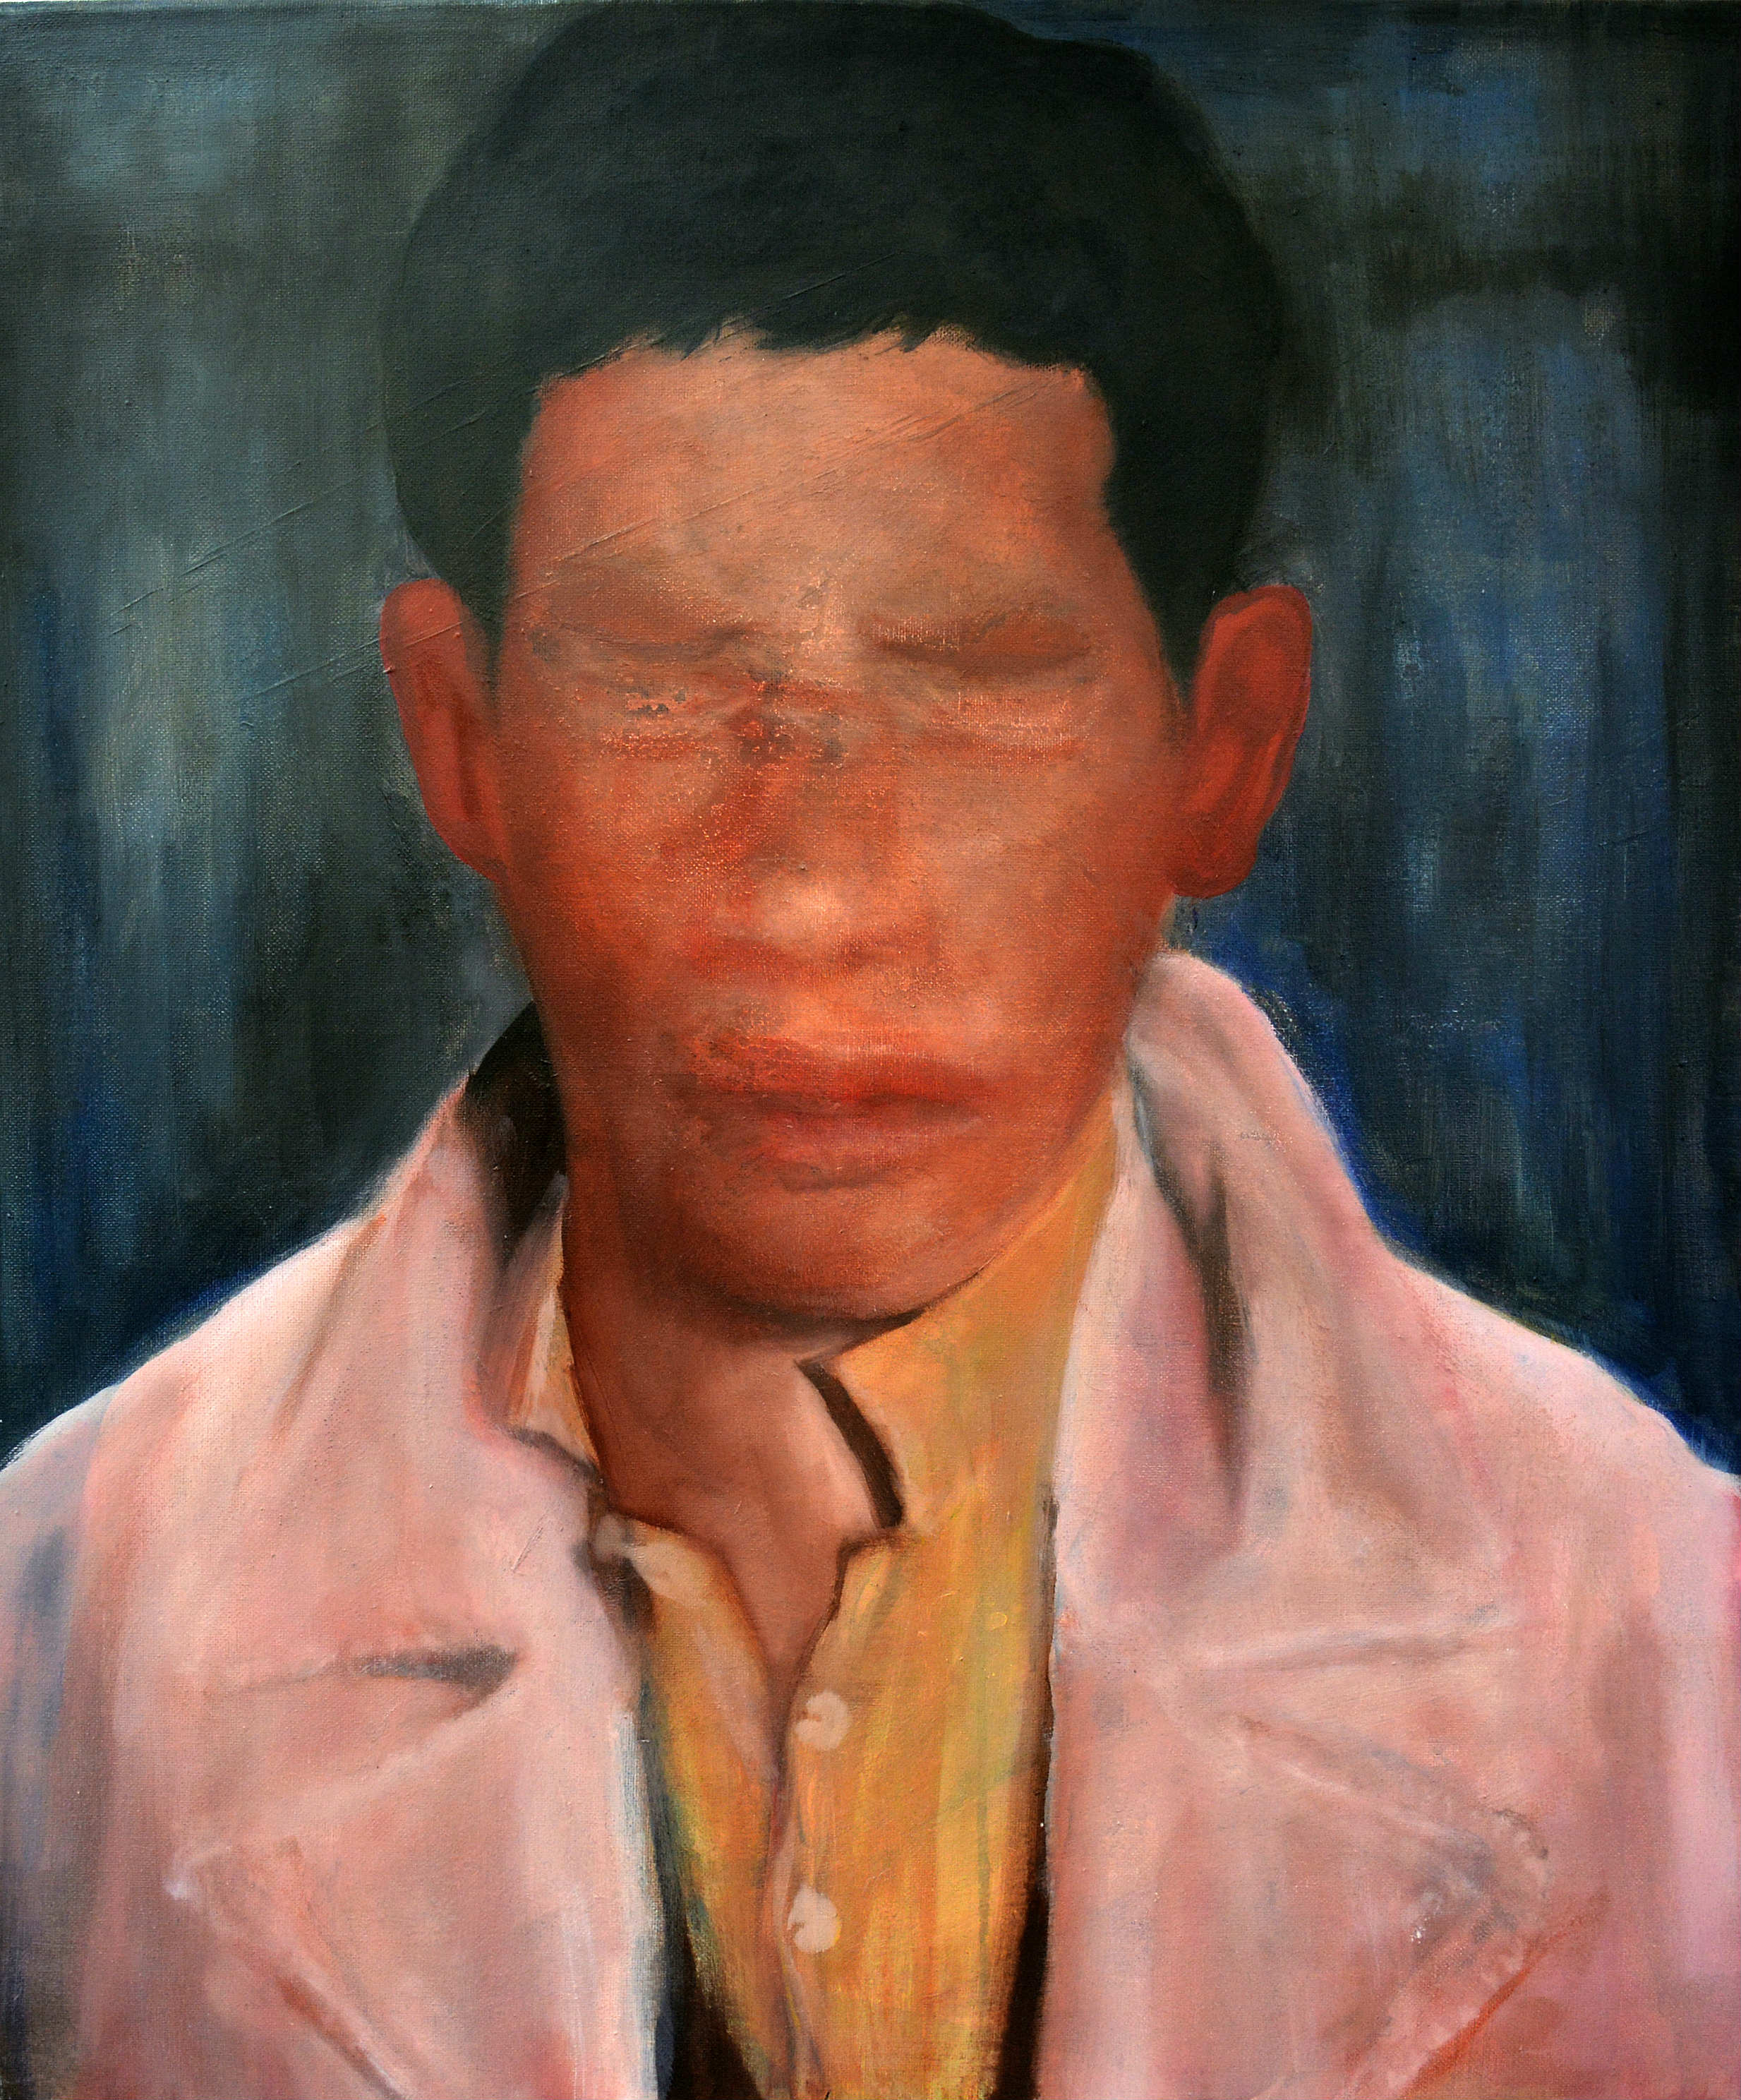 Dimitris Vavouras, When God took you back, 2016, oil on canvas, 55x72 cm